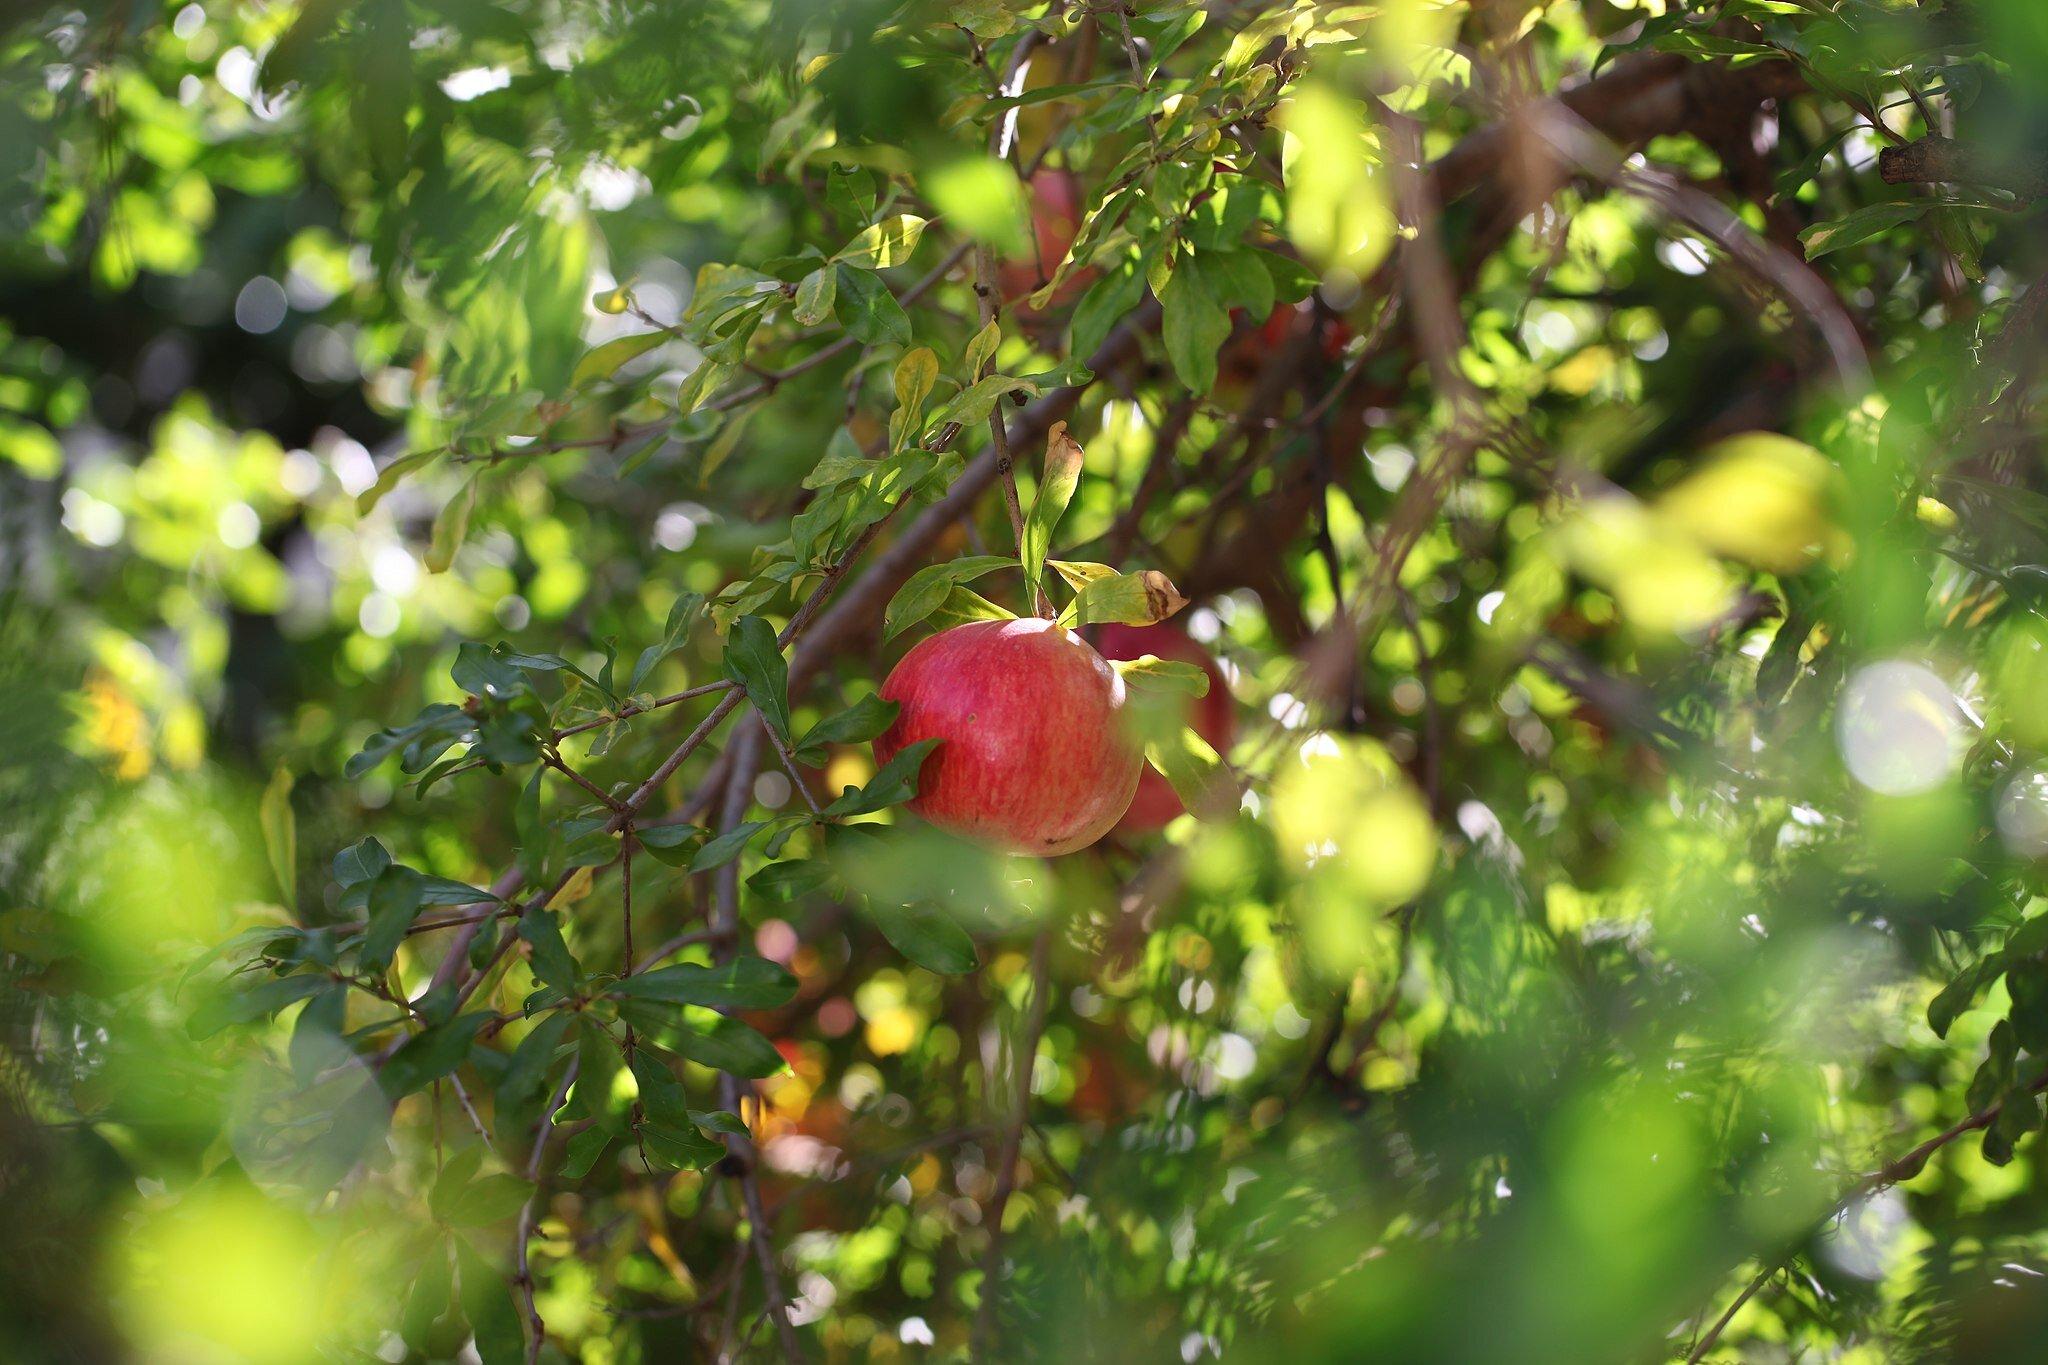 Pomegranate_tree.JPG